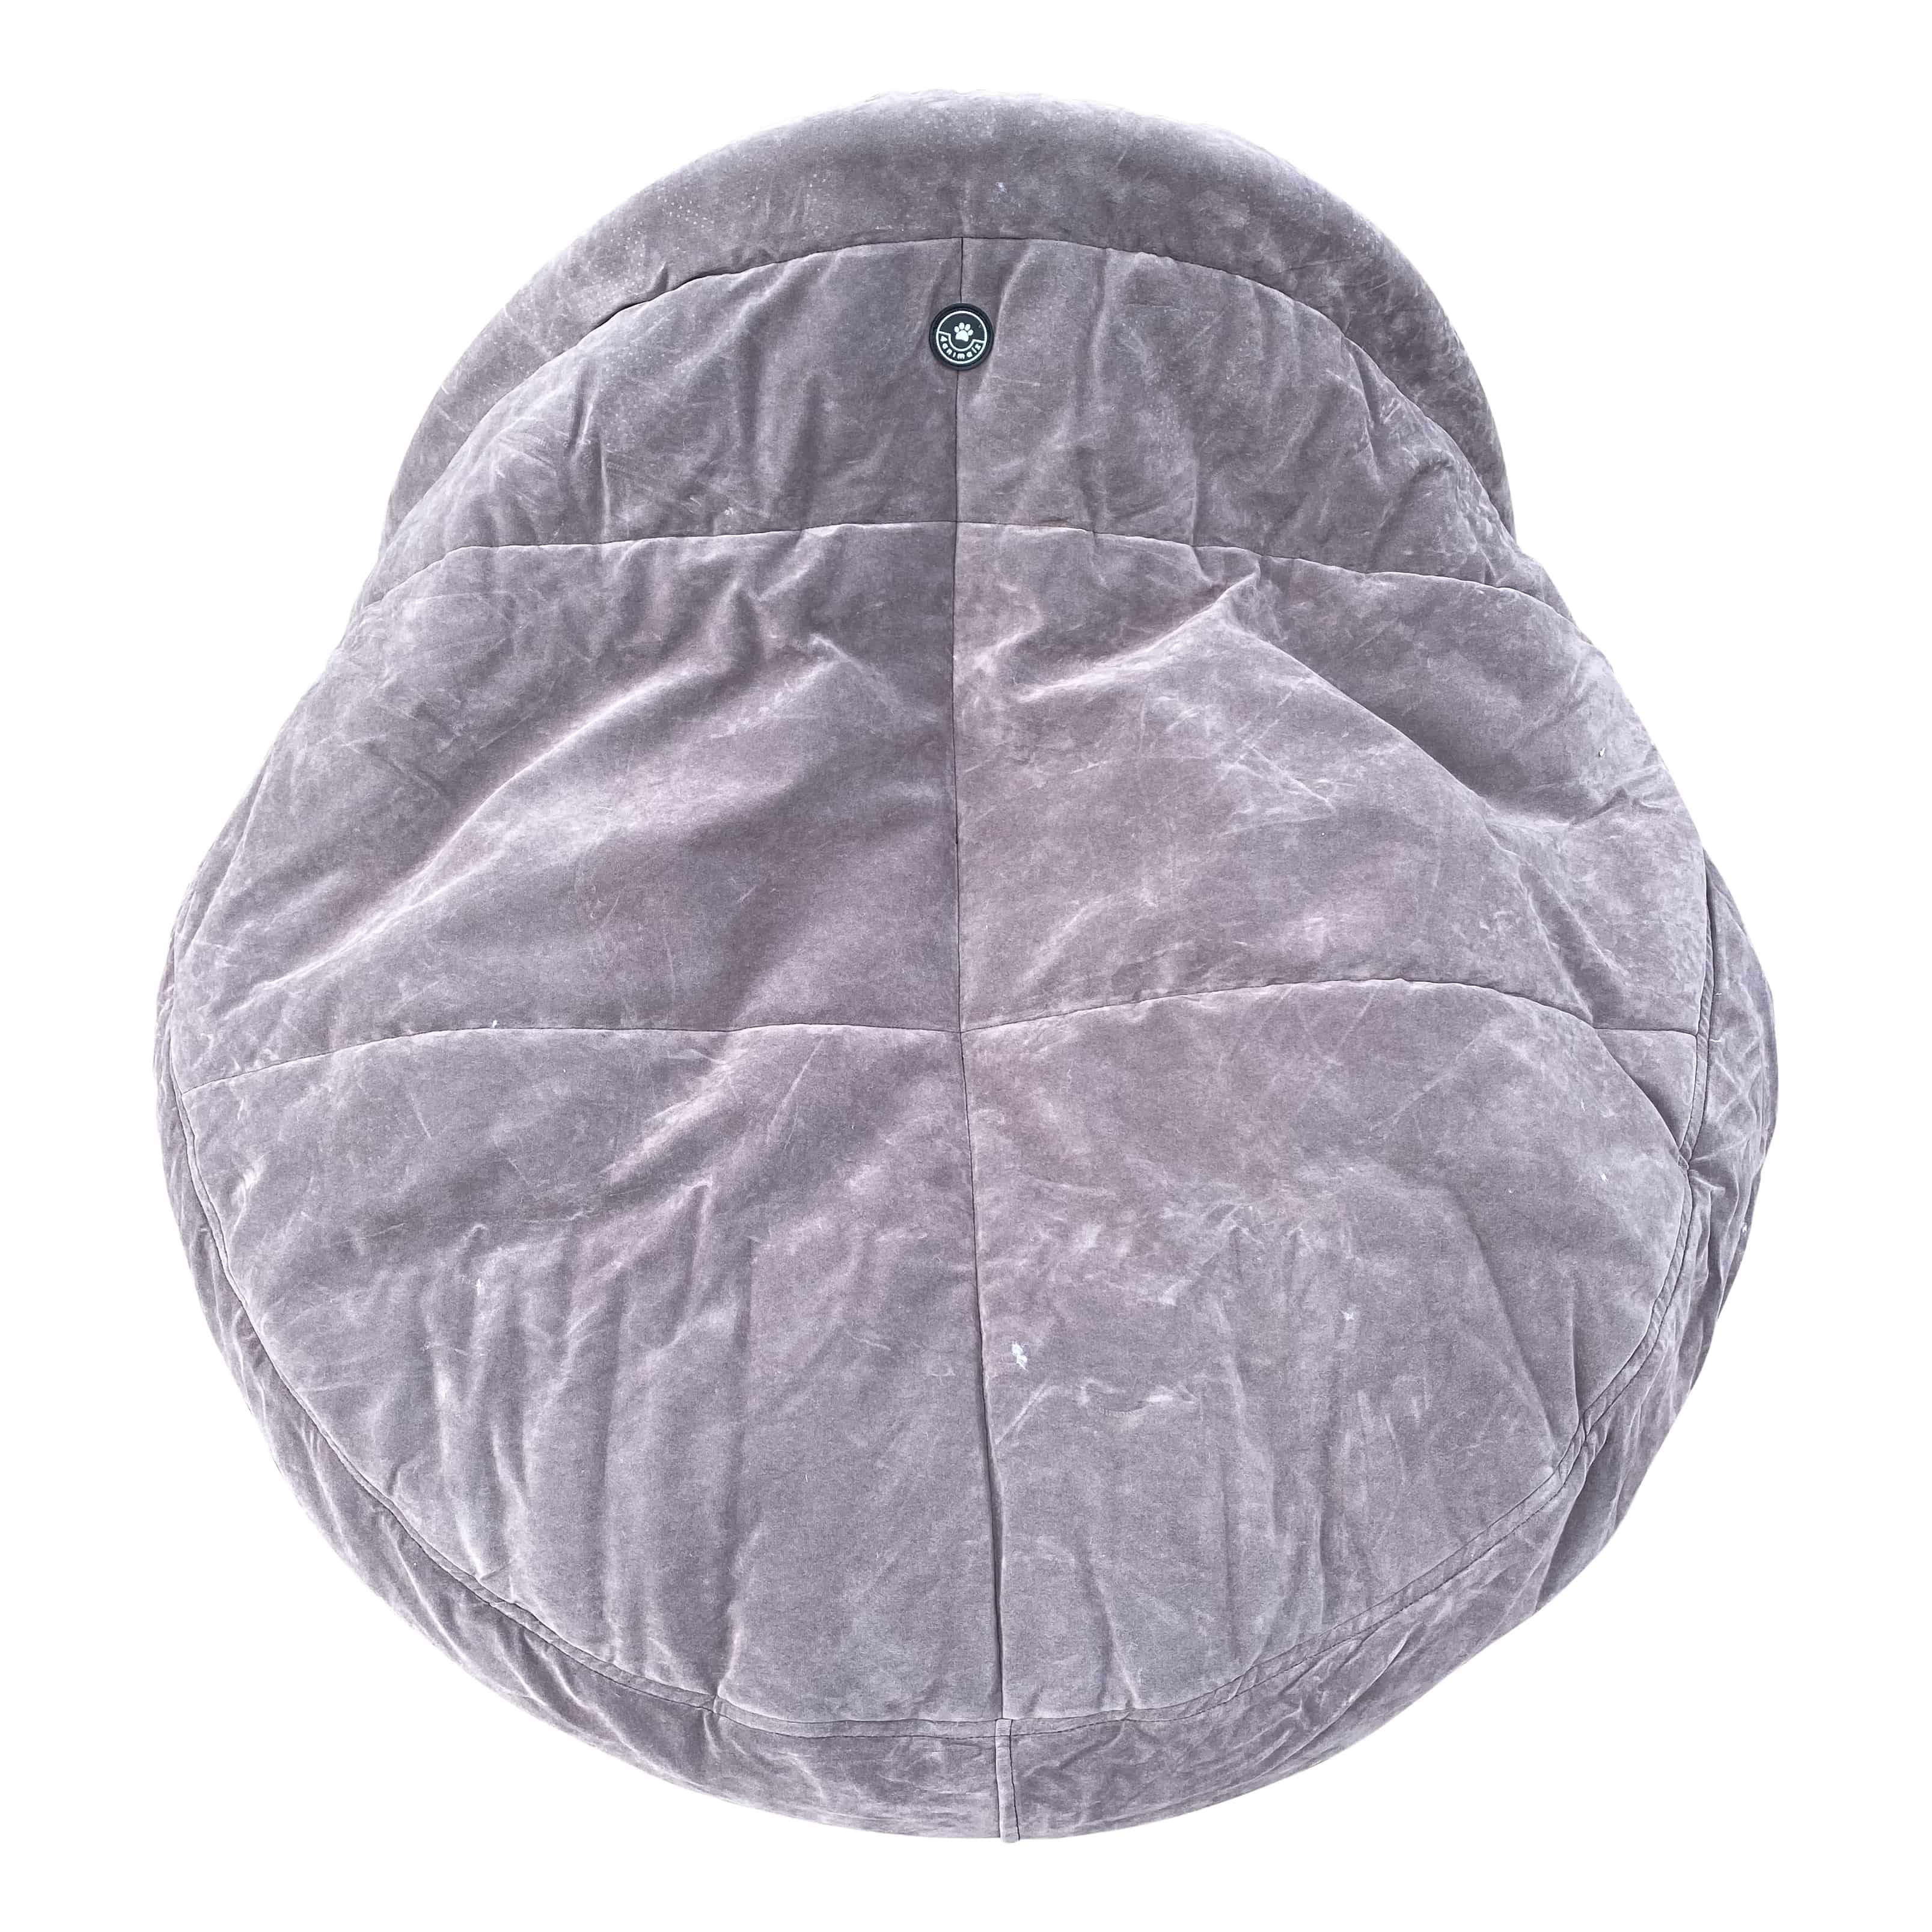 4animalz warme Snuggle mand L - 89x89x15 cm - Taupekleurig